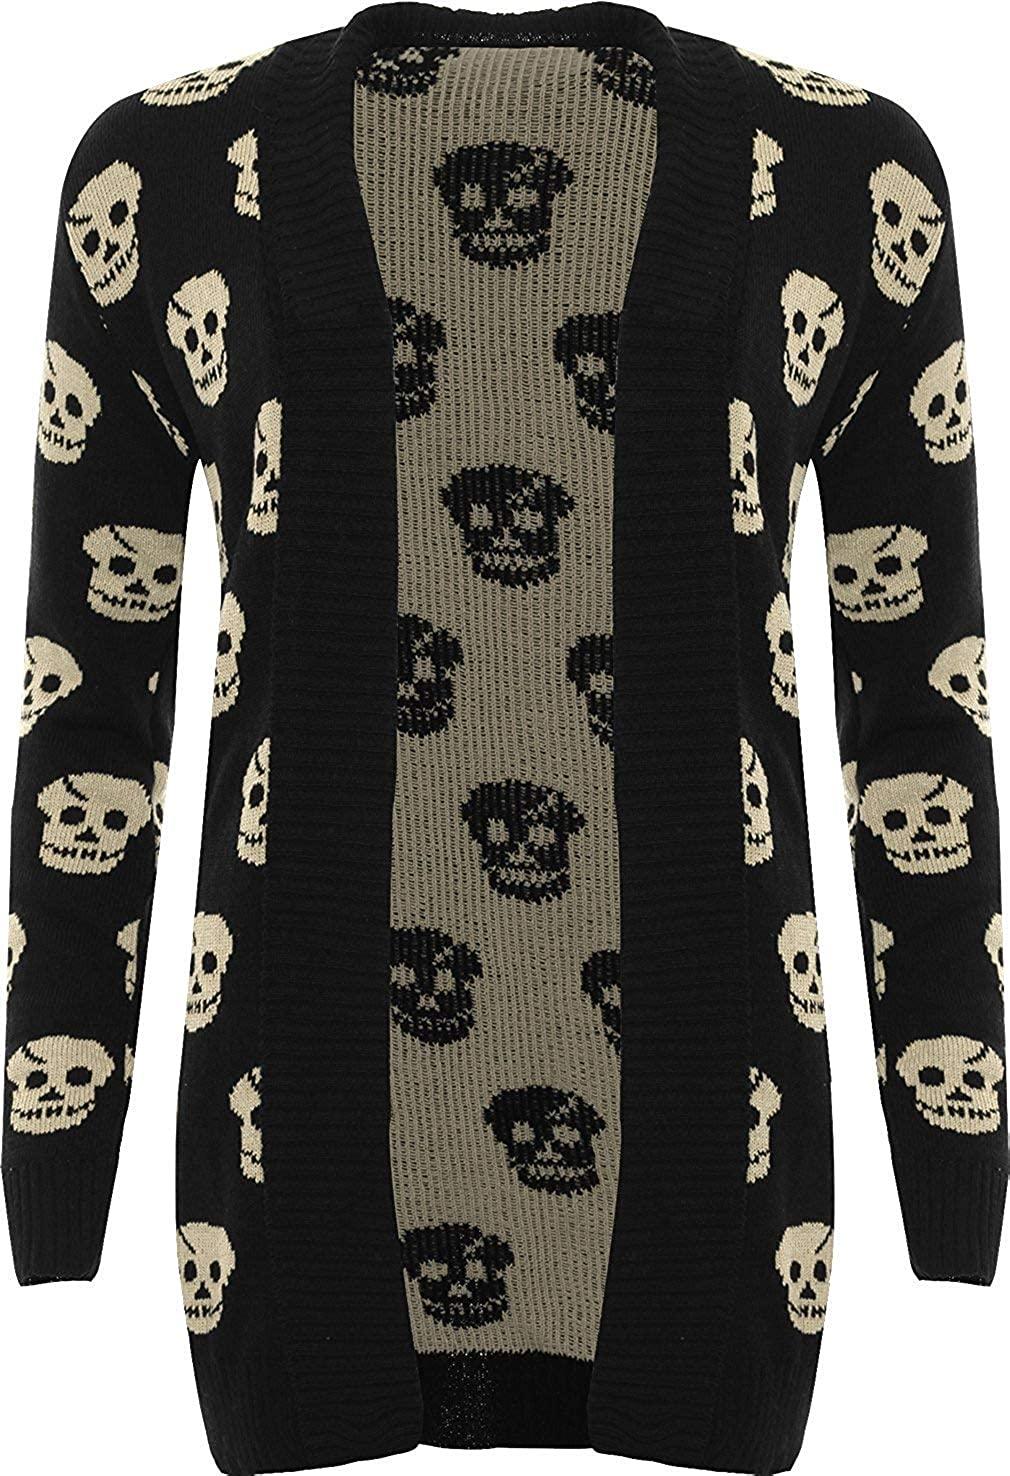 GirlzWalk Women's Ladies Knitted Skull Pattern Print Long Sleeve Open Cardigan